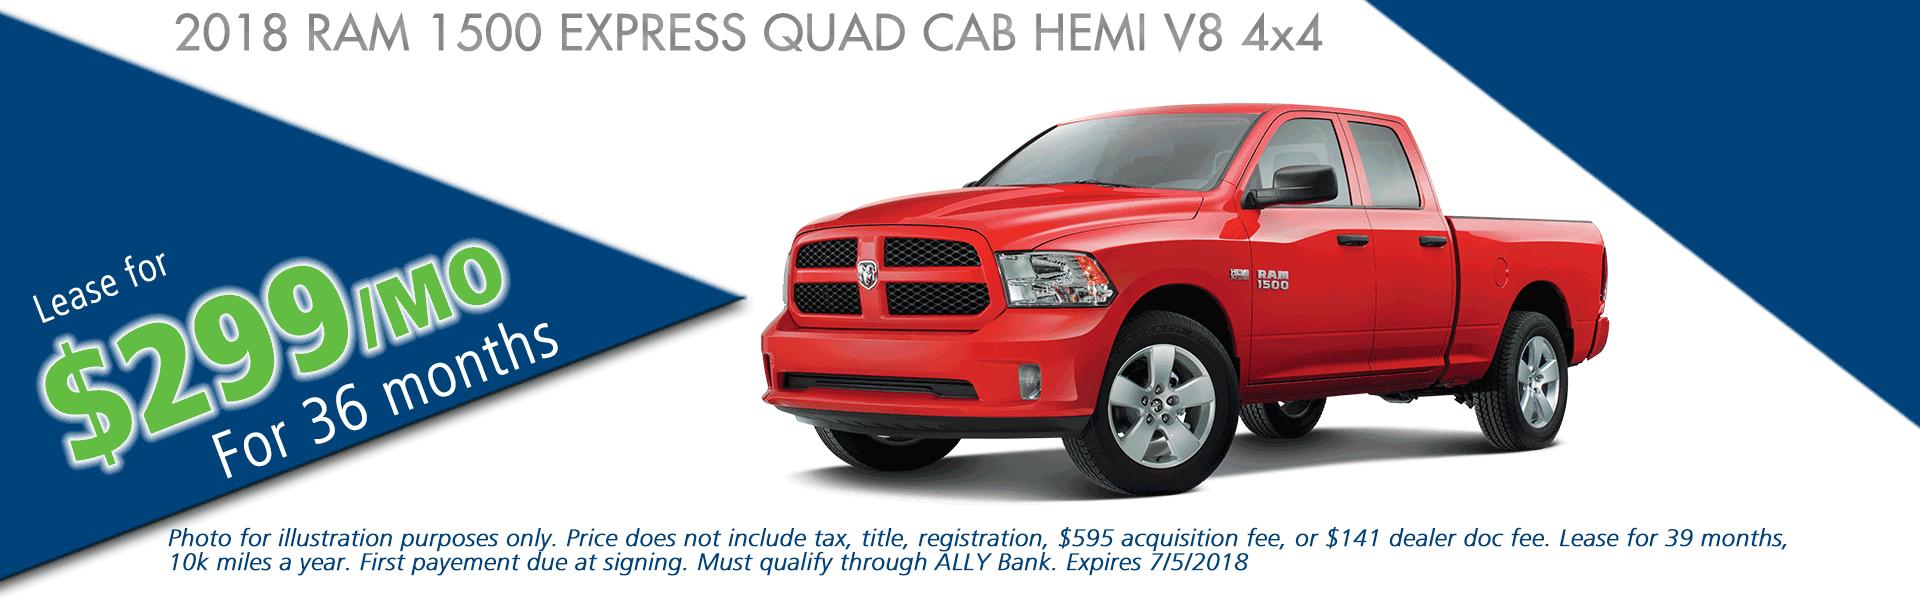 NEW 2018 RAM 1500 EXPRESS QUAD CAB 4X4 6'4 BOX carright chrysler jeep dodge ram moon township pennsylvania pittsburgh